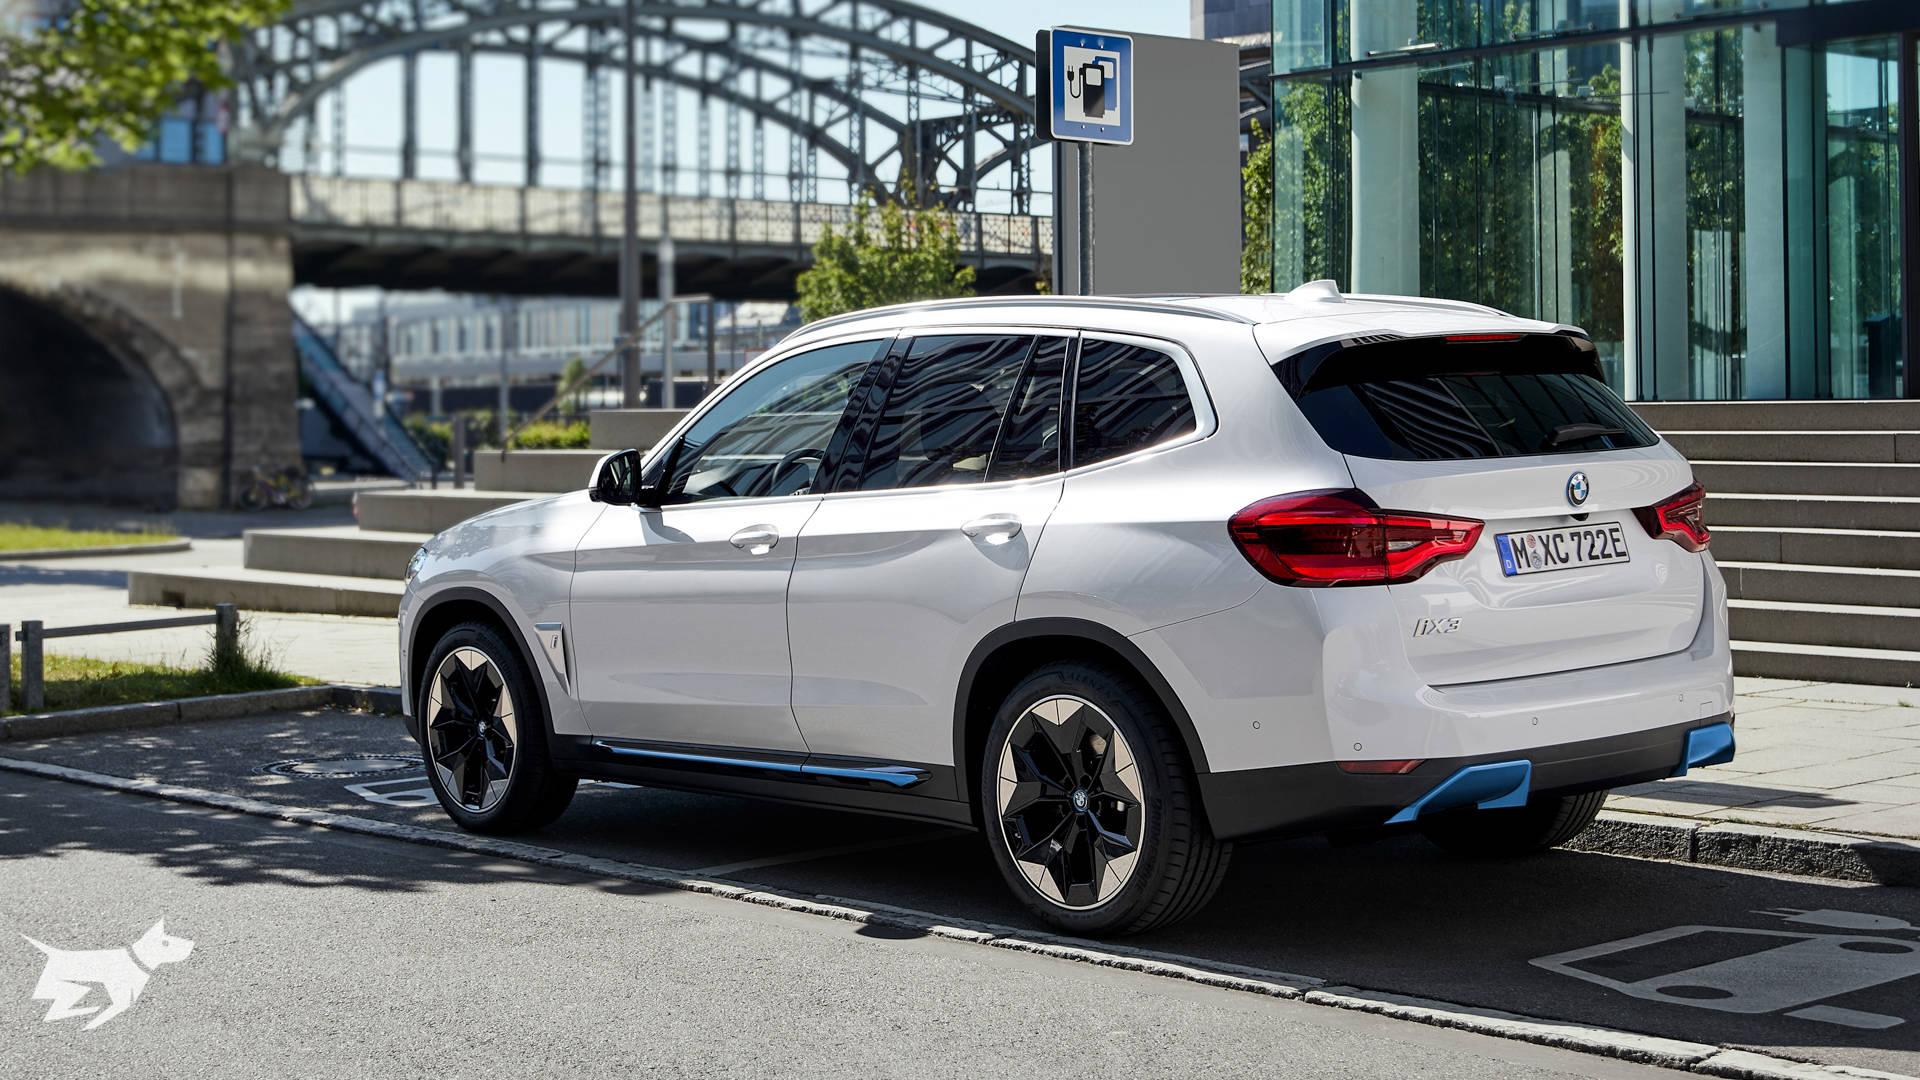 BMW iX3 electric SUV charging